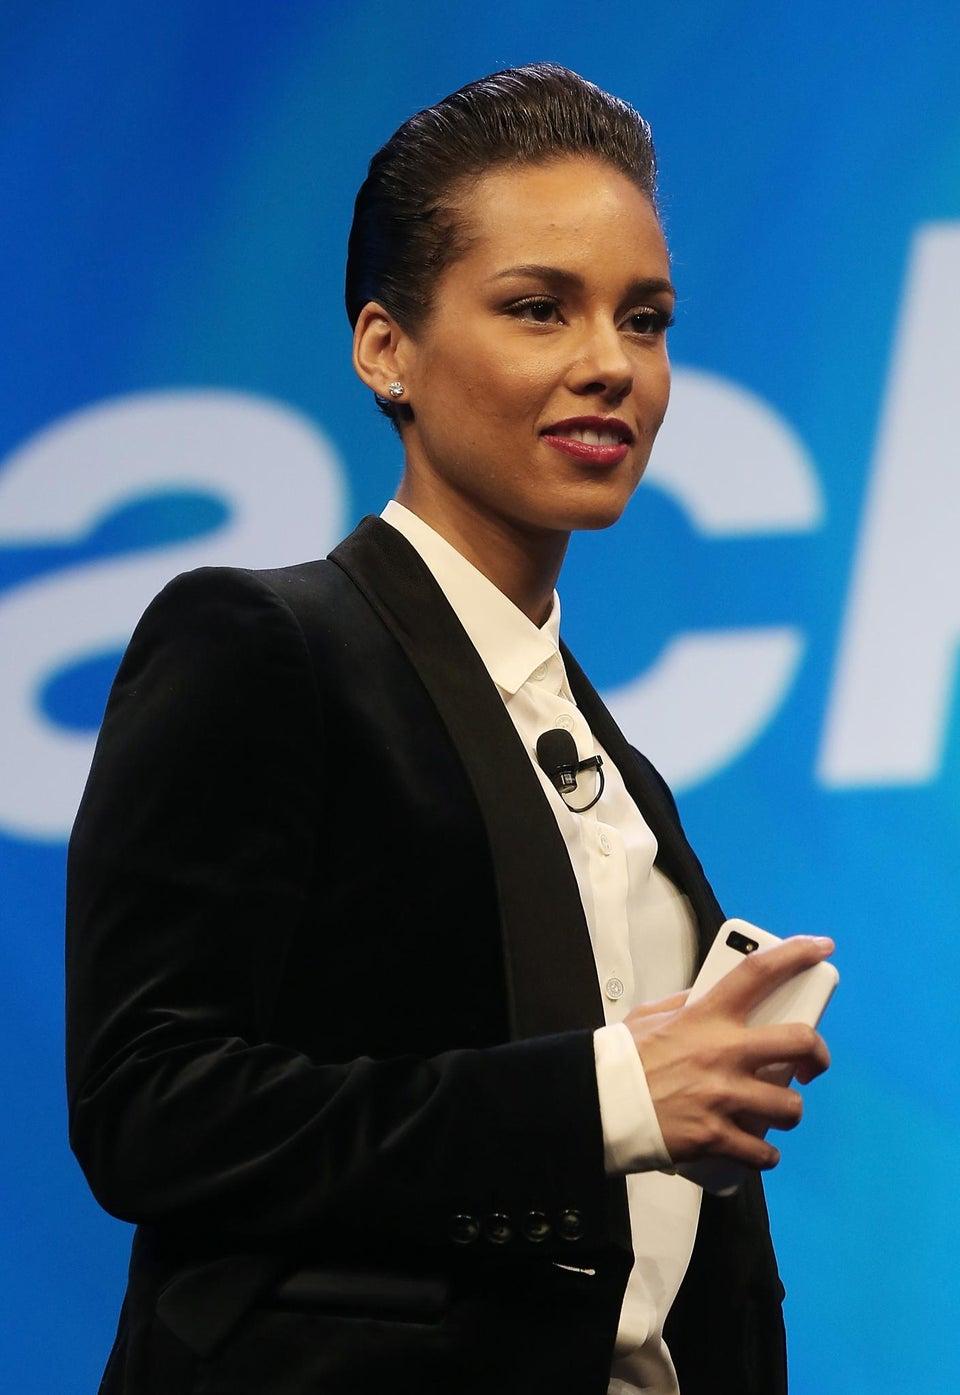 Alicia Keys Named BlackBerry Global Creative Director